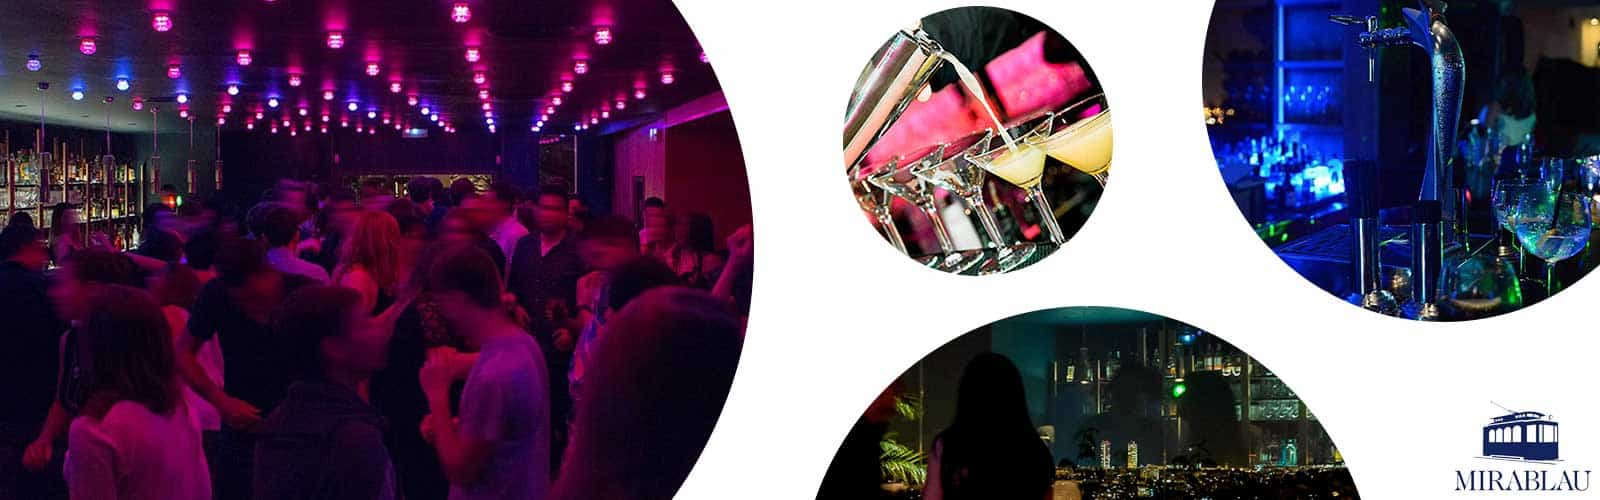 Nightclub Mirablau Barcelona